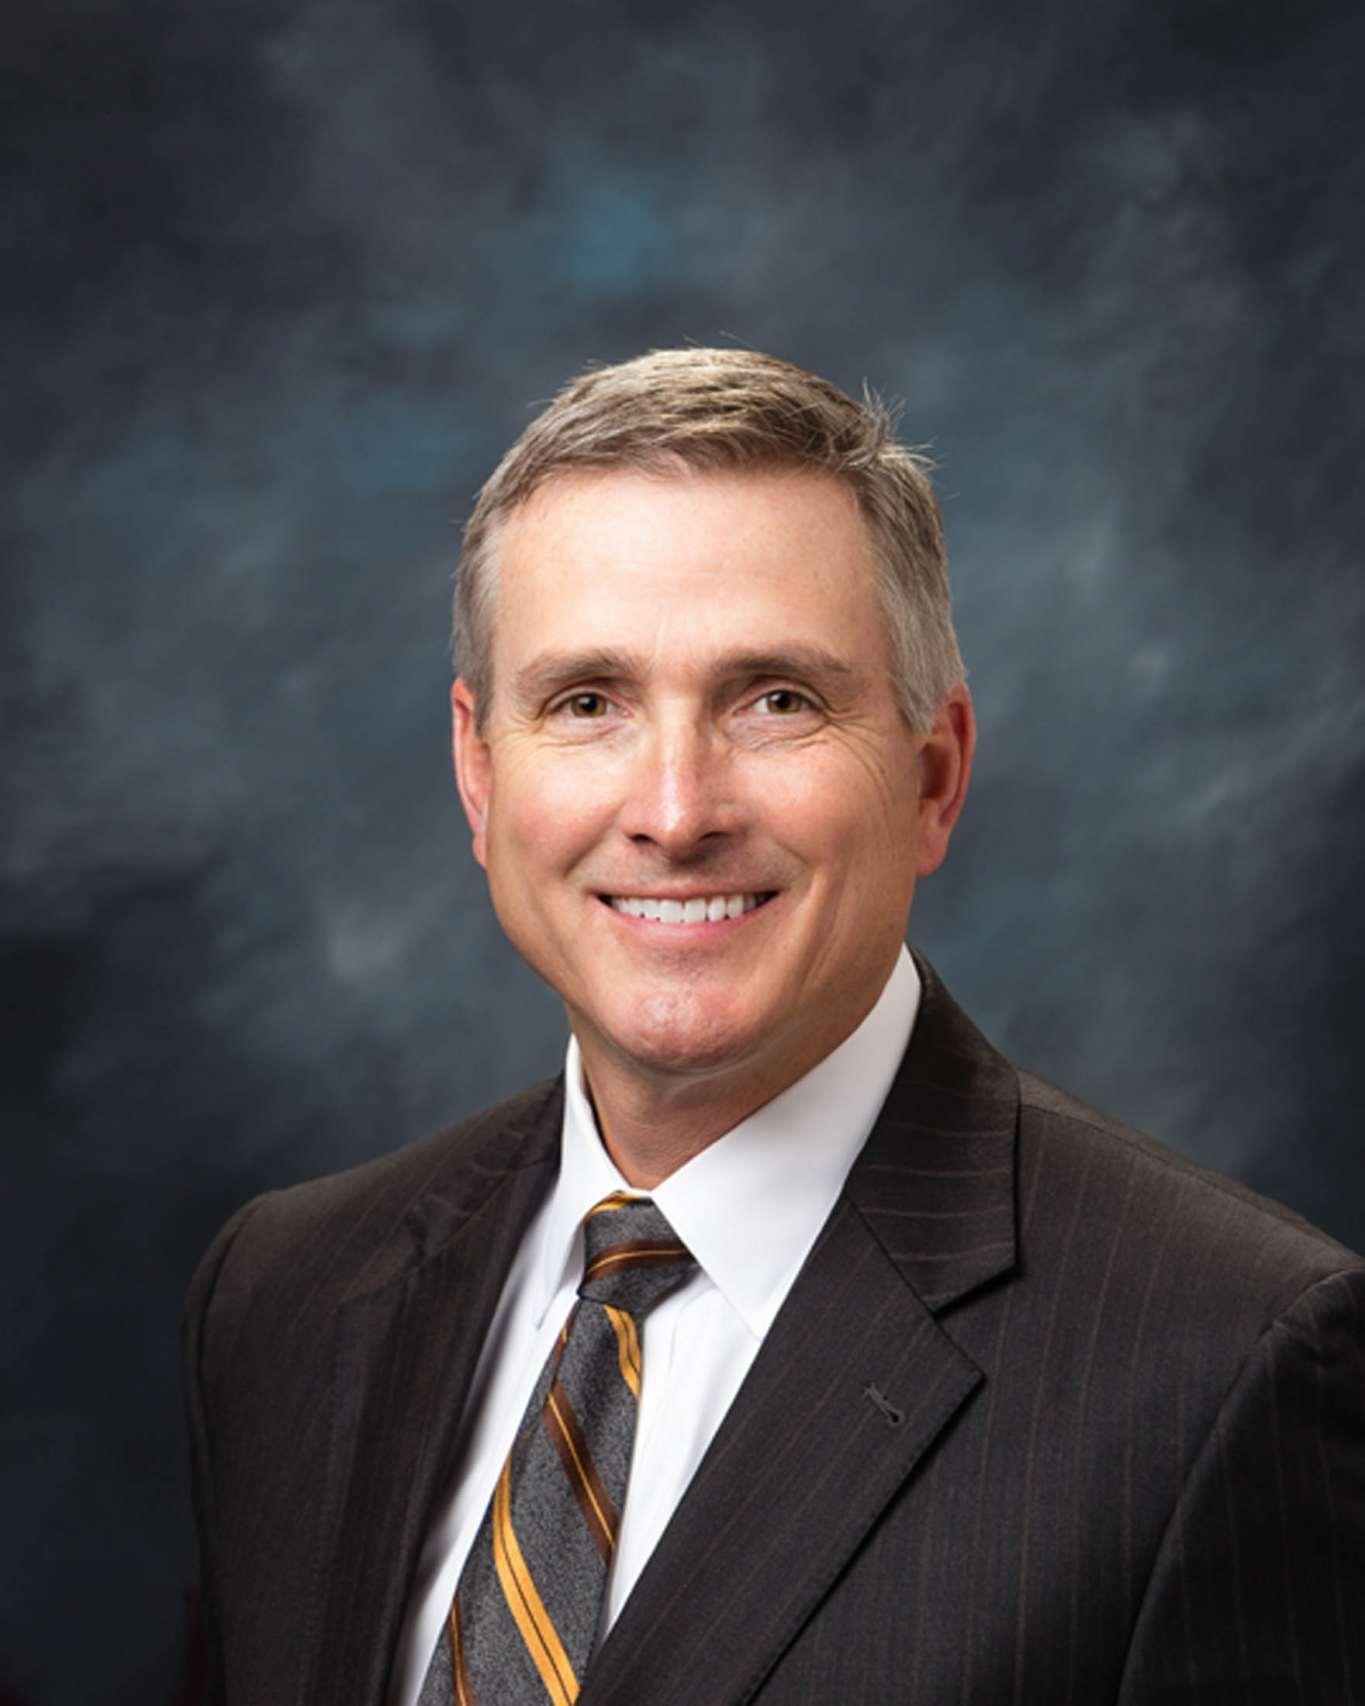 Bob Dowson, Managing Director, Dignity Memorial